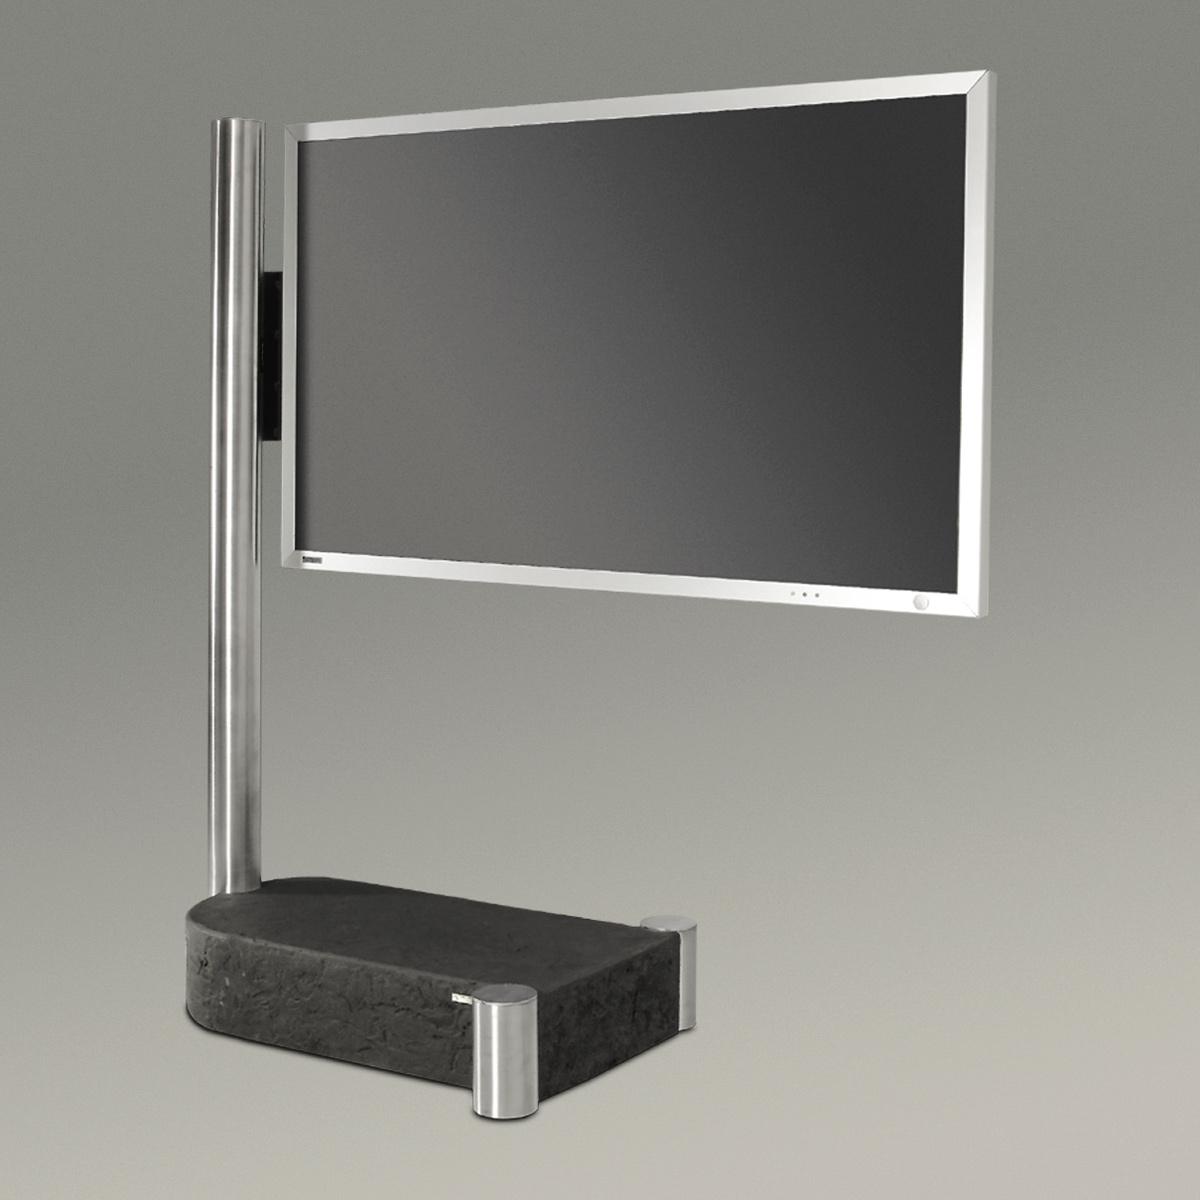 wissmann raumobjekte archive tv m bel und hifi m bel guide. Black Bedroom Furniture Sets. Home Design Ideas